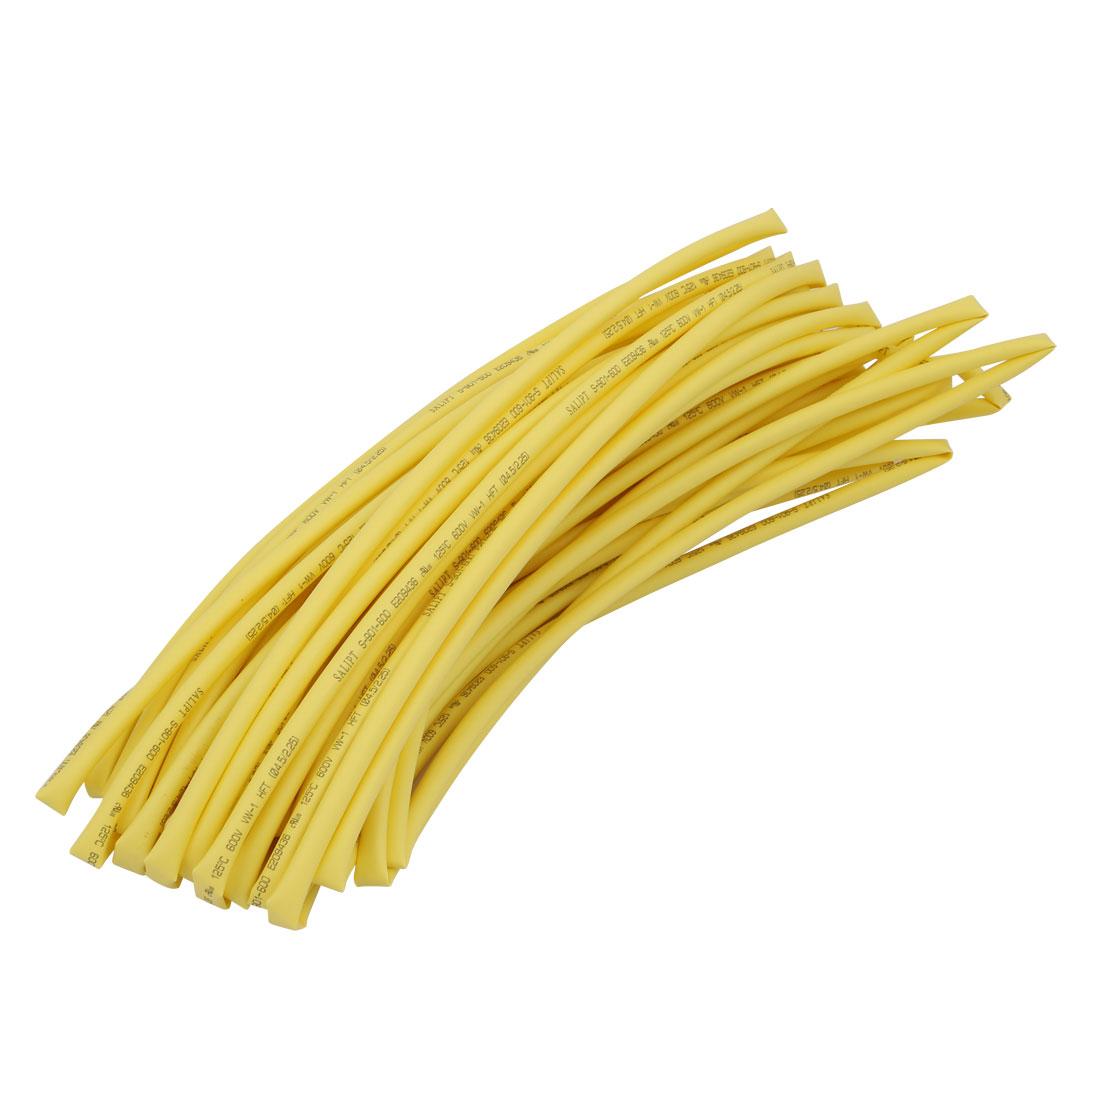 15M 0.18in Inner Dia Polyolefin Flame Retardant Tube Yellow for Wire Repairing